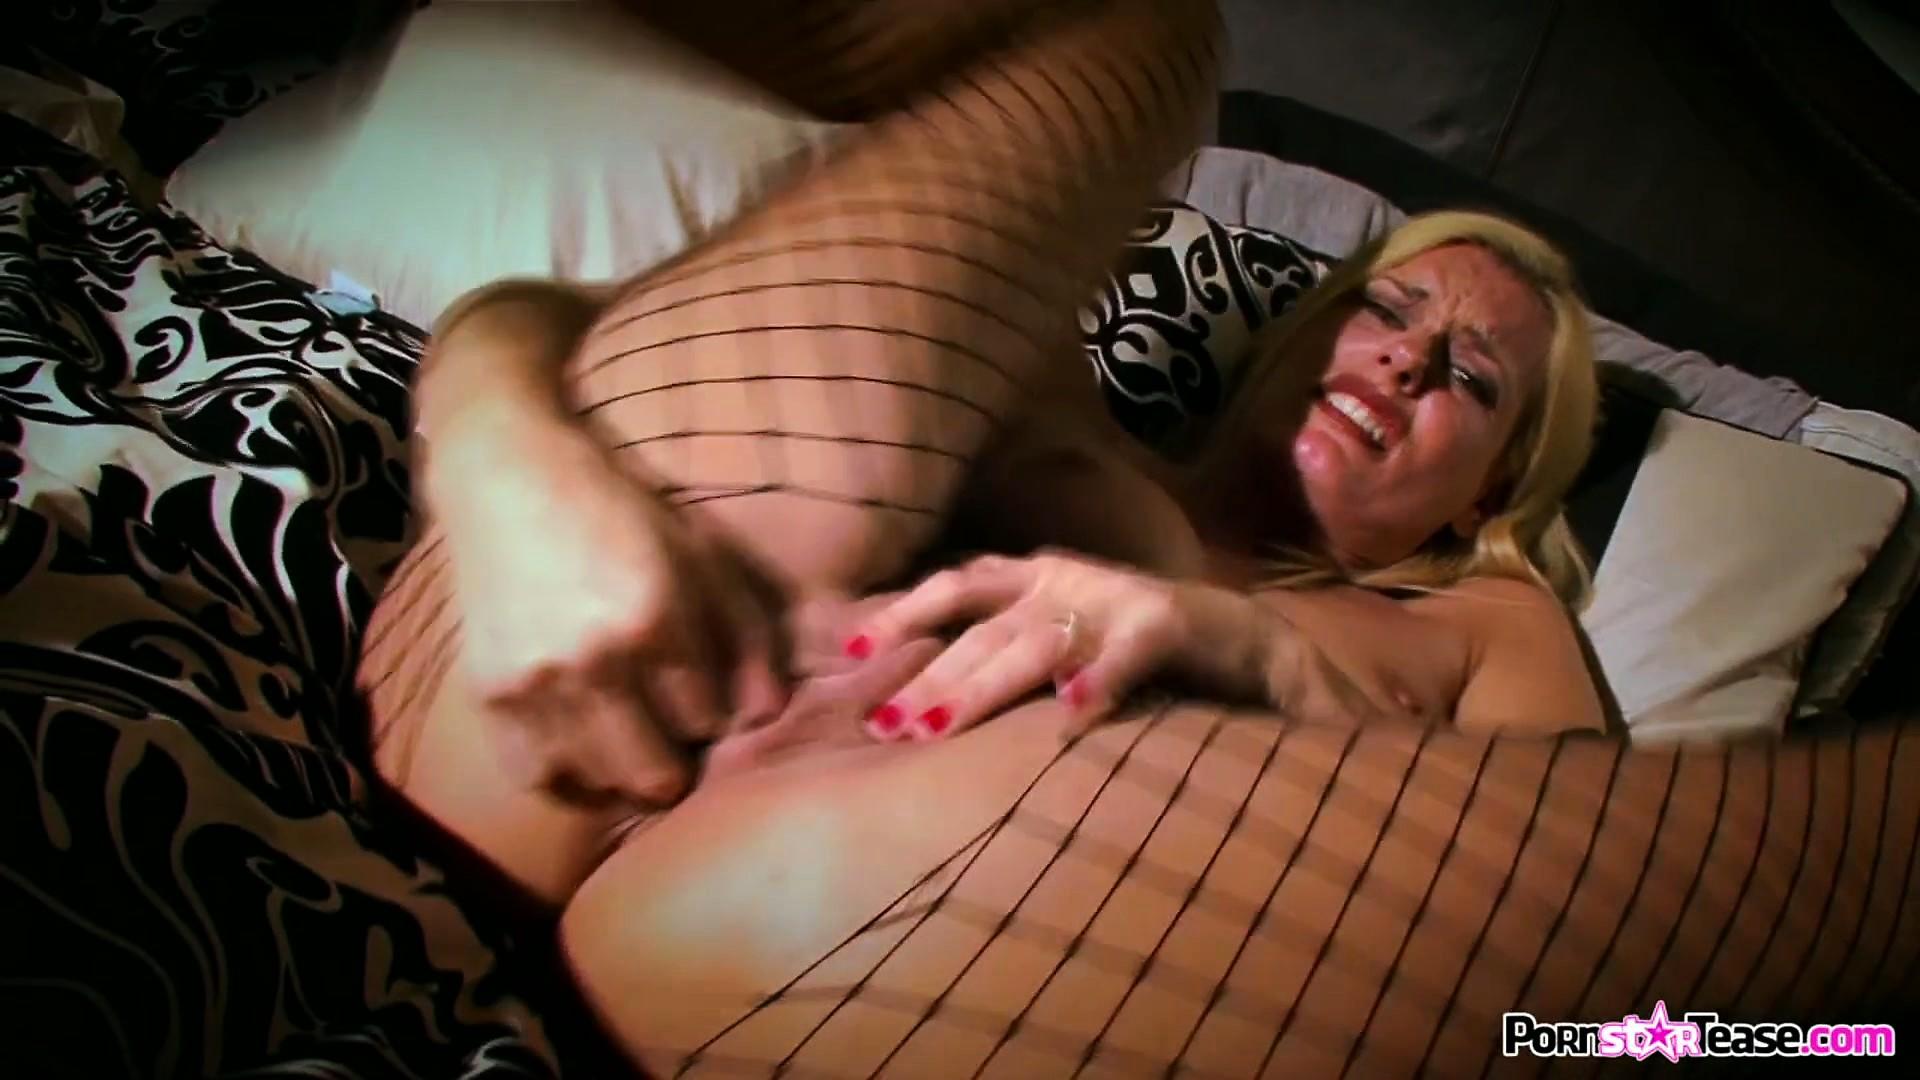 Free long movie porn sex slick